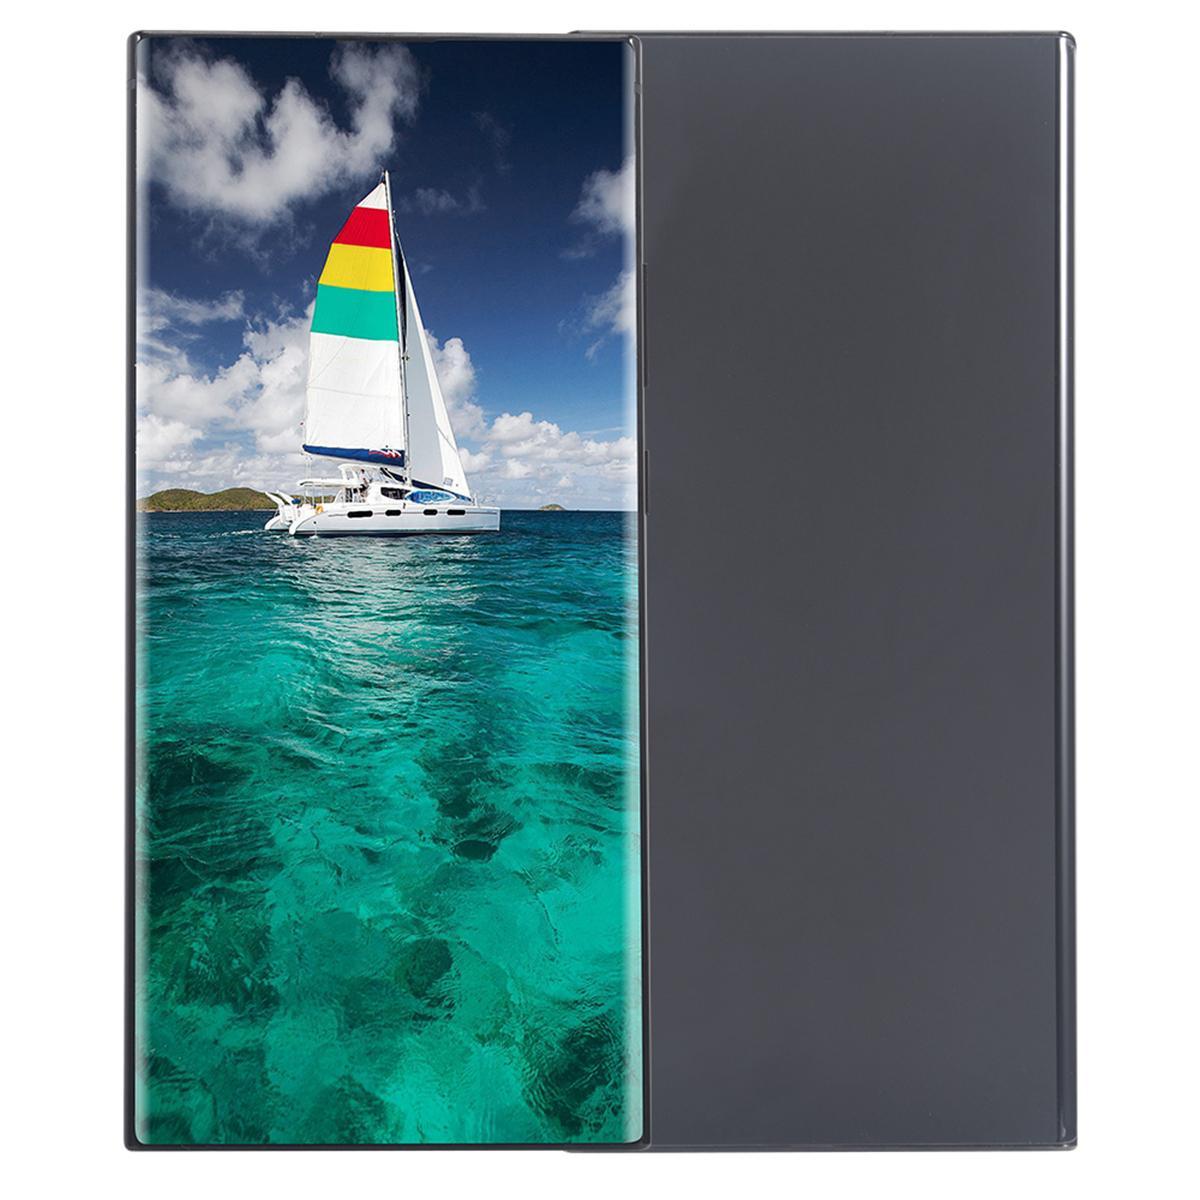 Ücretsiz DHL 2 GB 16 GB Goophone N20 5g 6.7 inç Punch-Hole Tam Ekran Android 10 Dört Çekirdekli 3G WCDMA Yüz KIMLIK Parmak İzi Smartphone Mistik Bronz